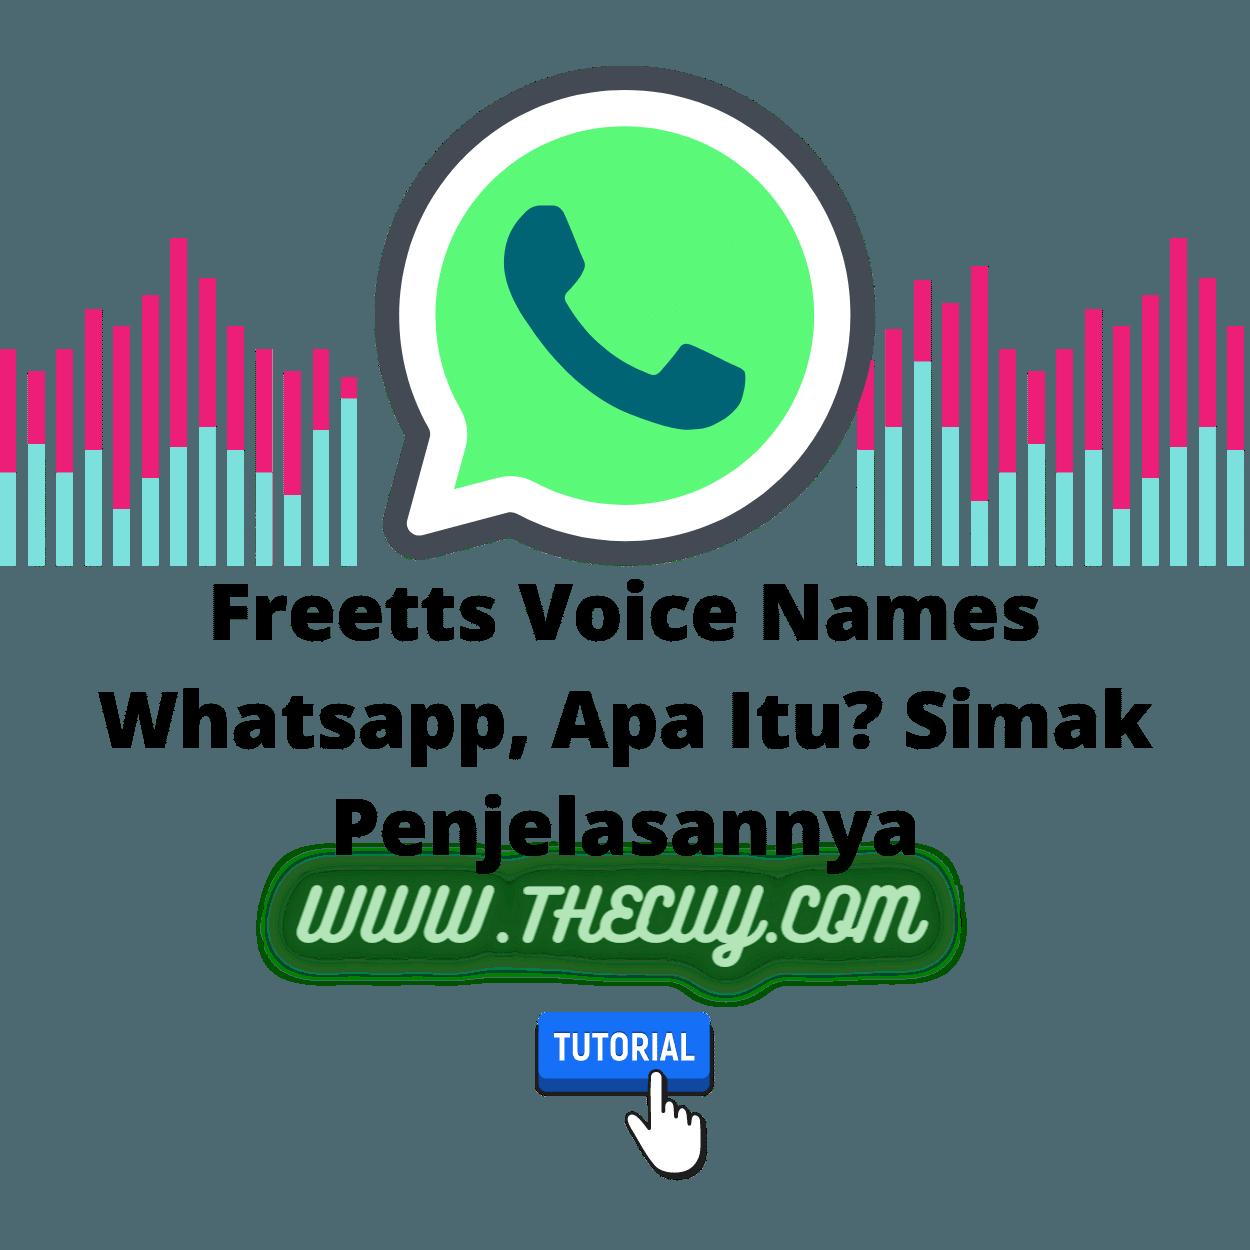 Freetts Voice Names Whatsapp, Apa Itu? Simak Penjelasannya